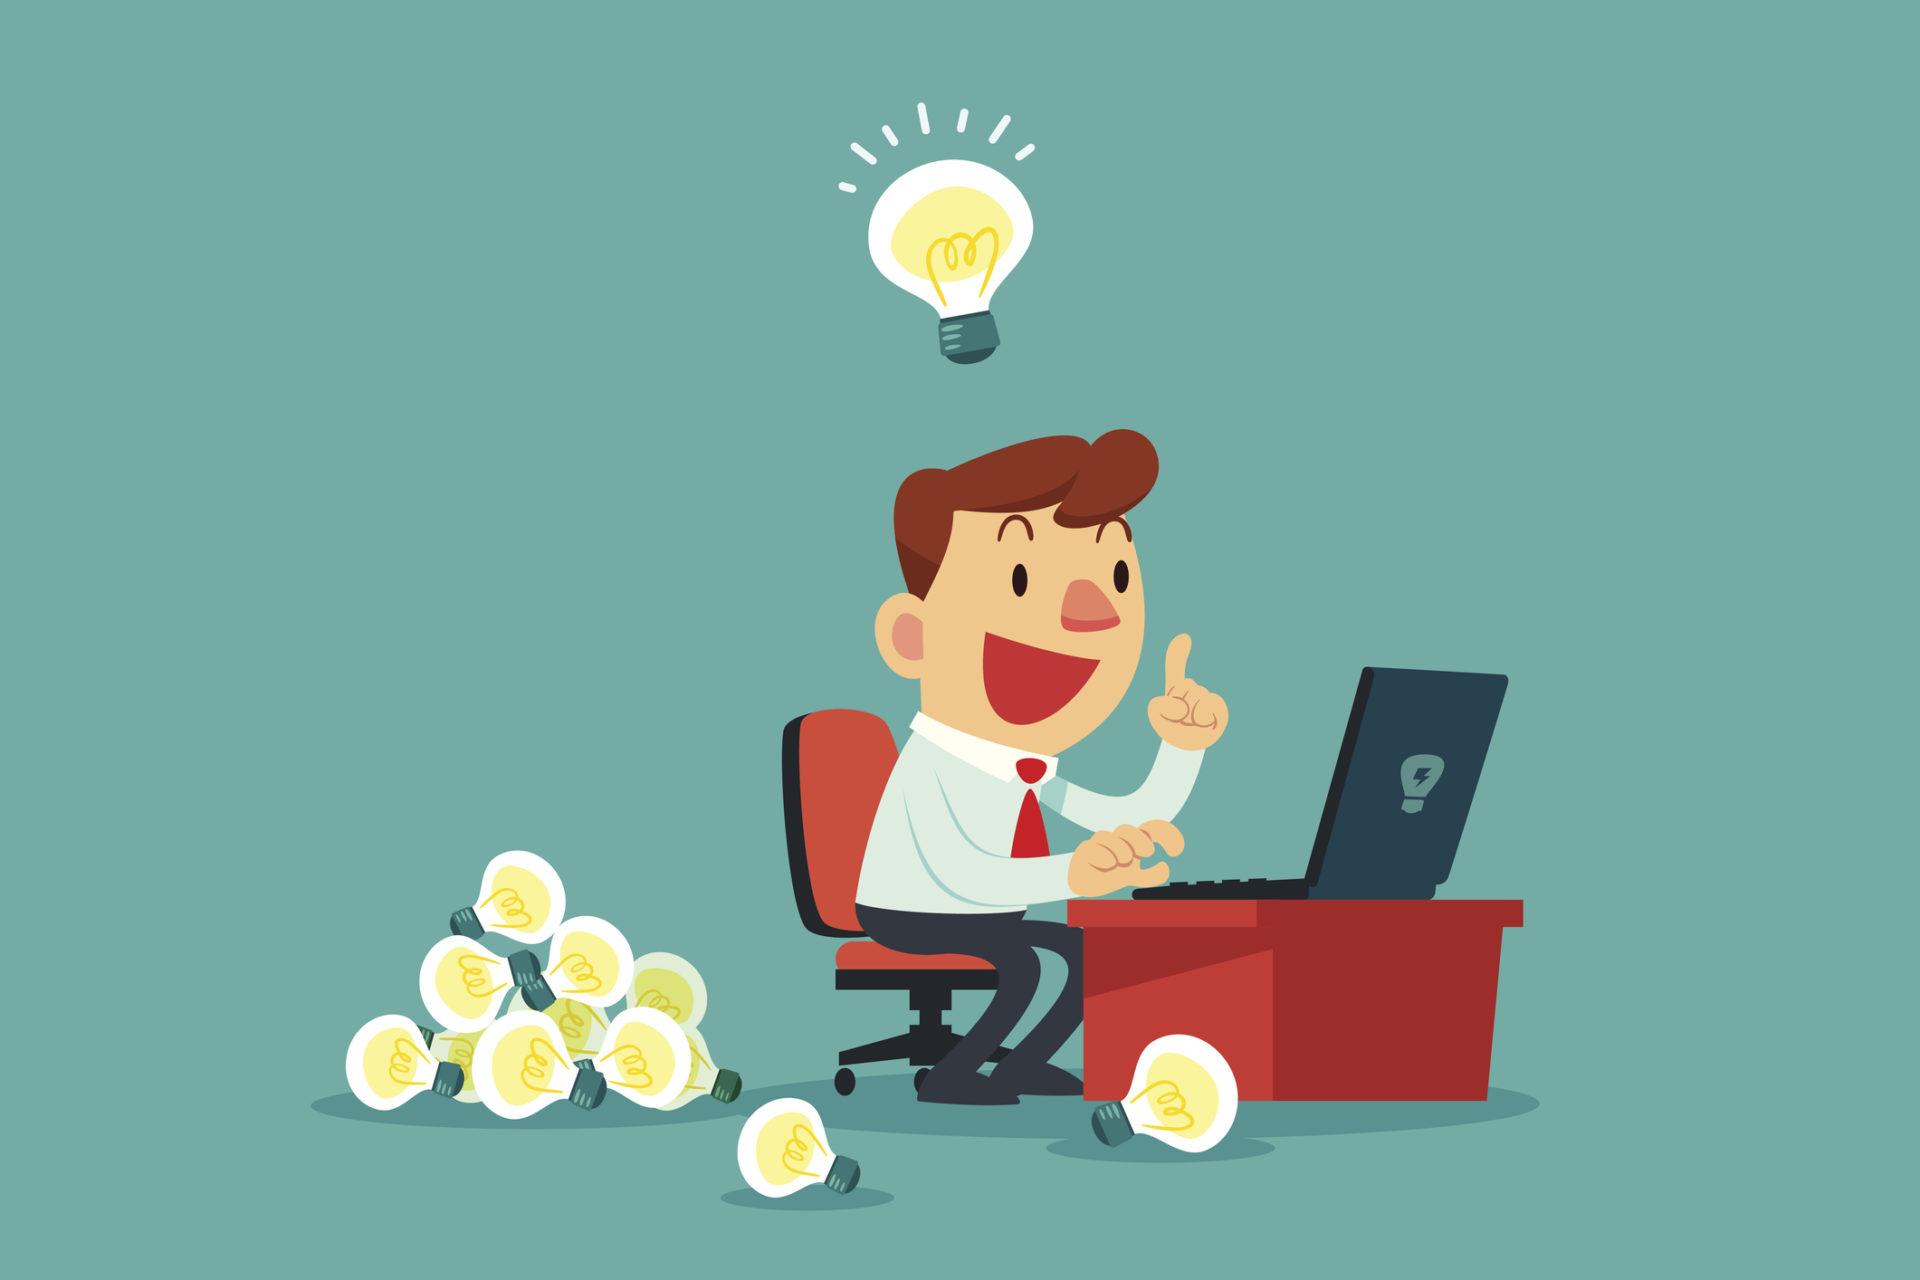 businessman at his desk creating a lot of idea bulbs